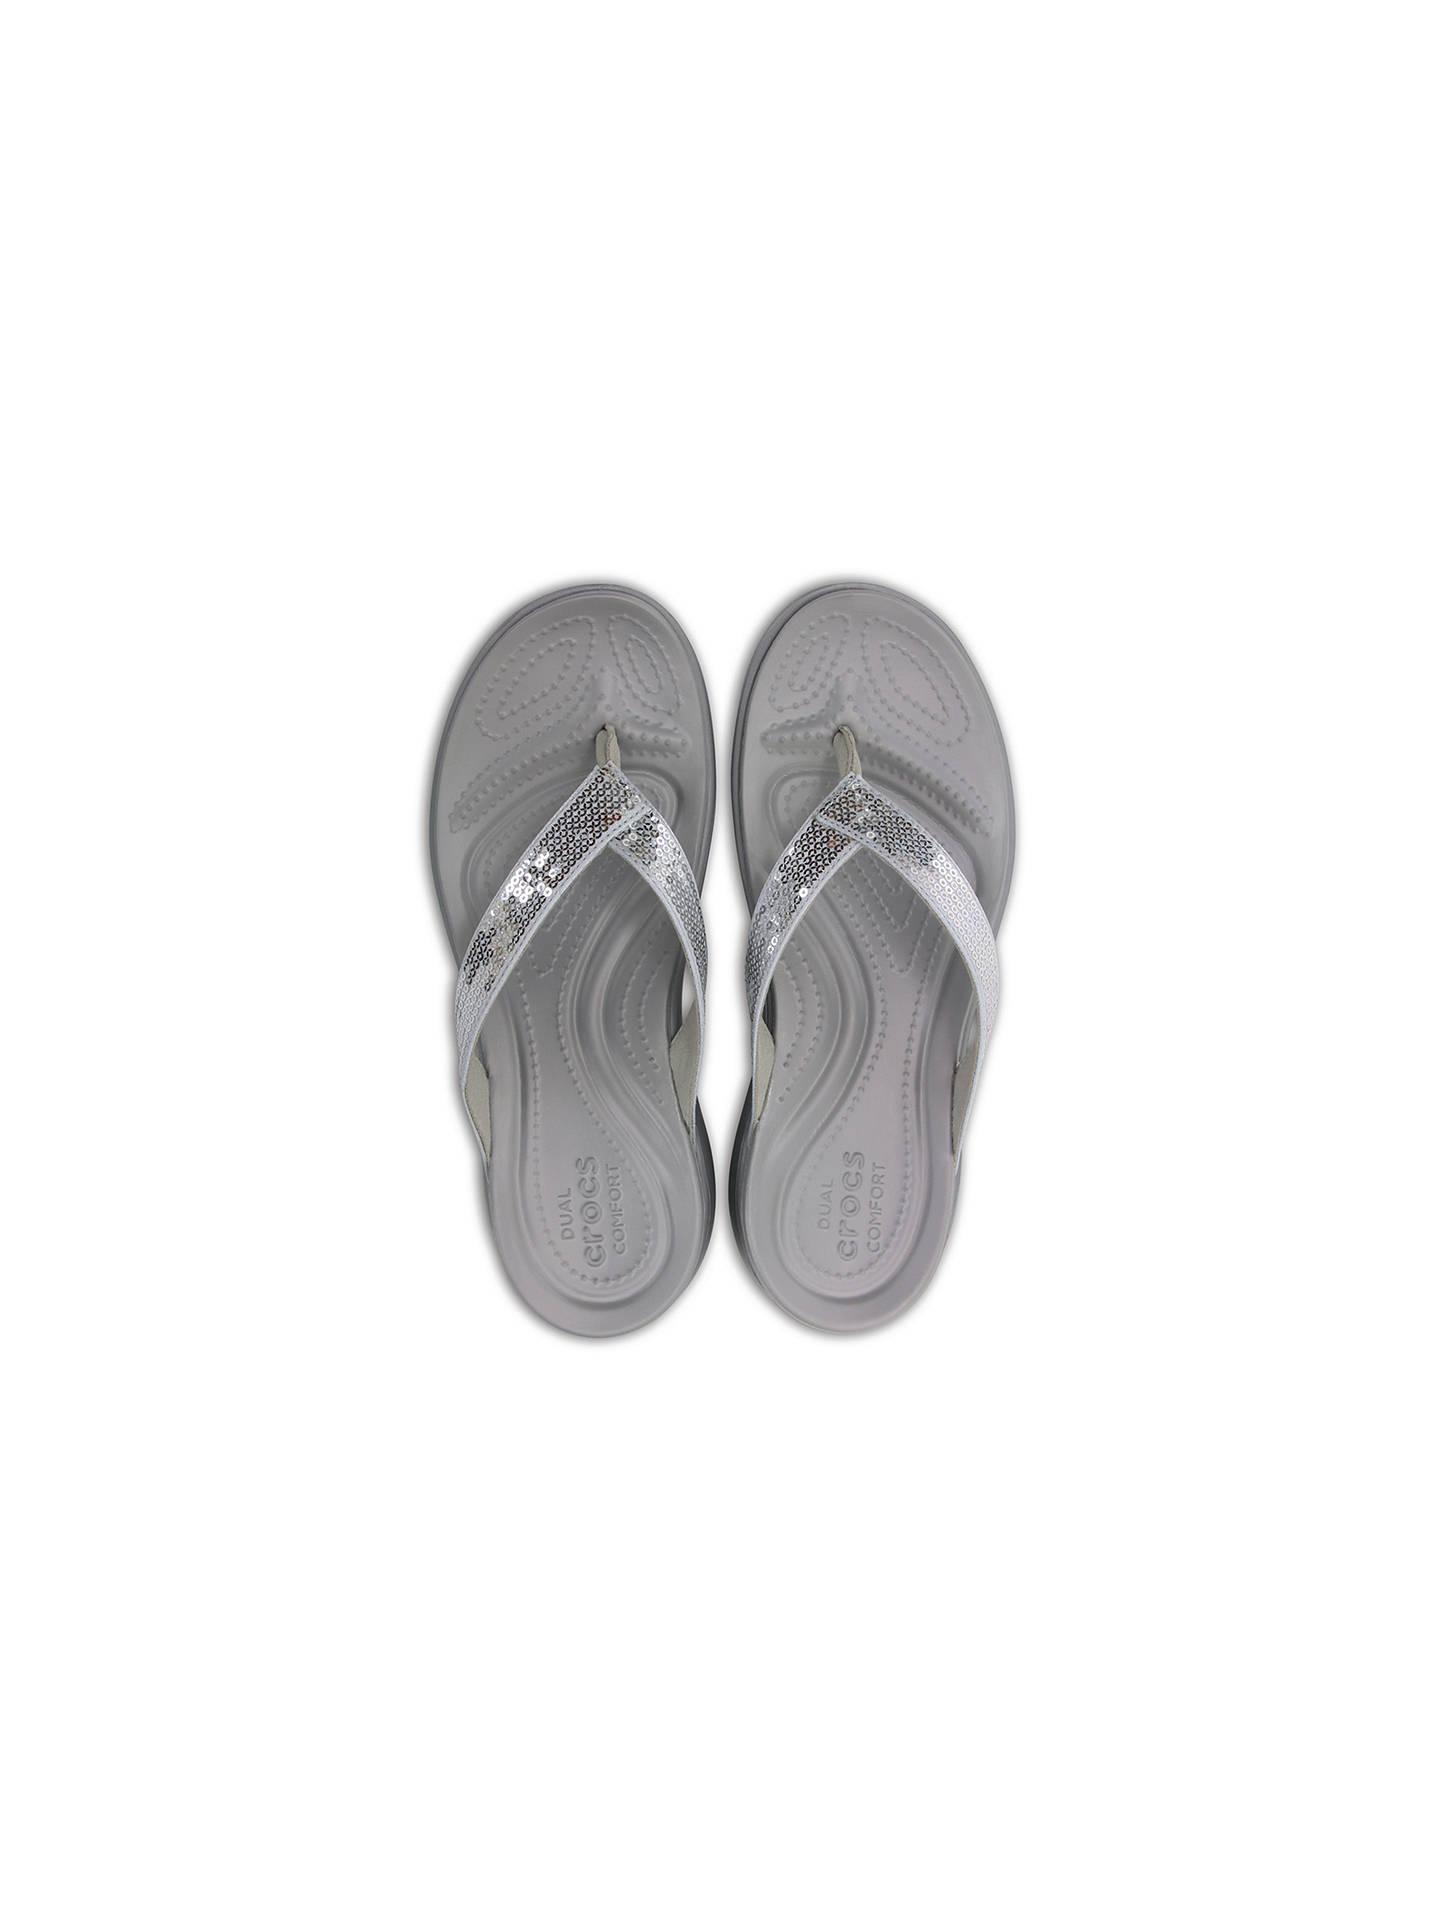 9b0026e6bab8 ... Buy Crocs Capri V Sequin Flip Flops